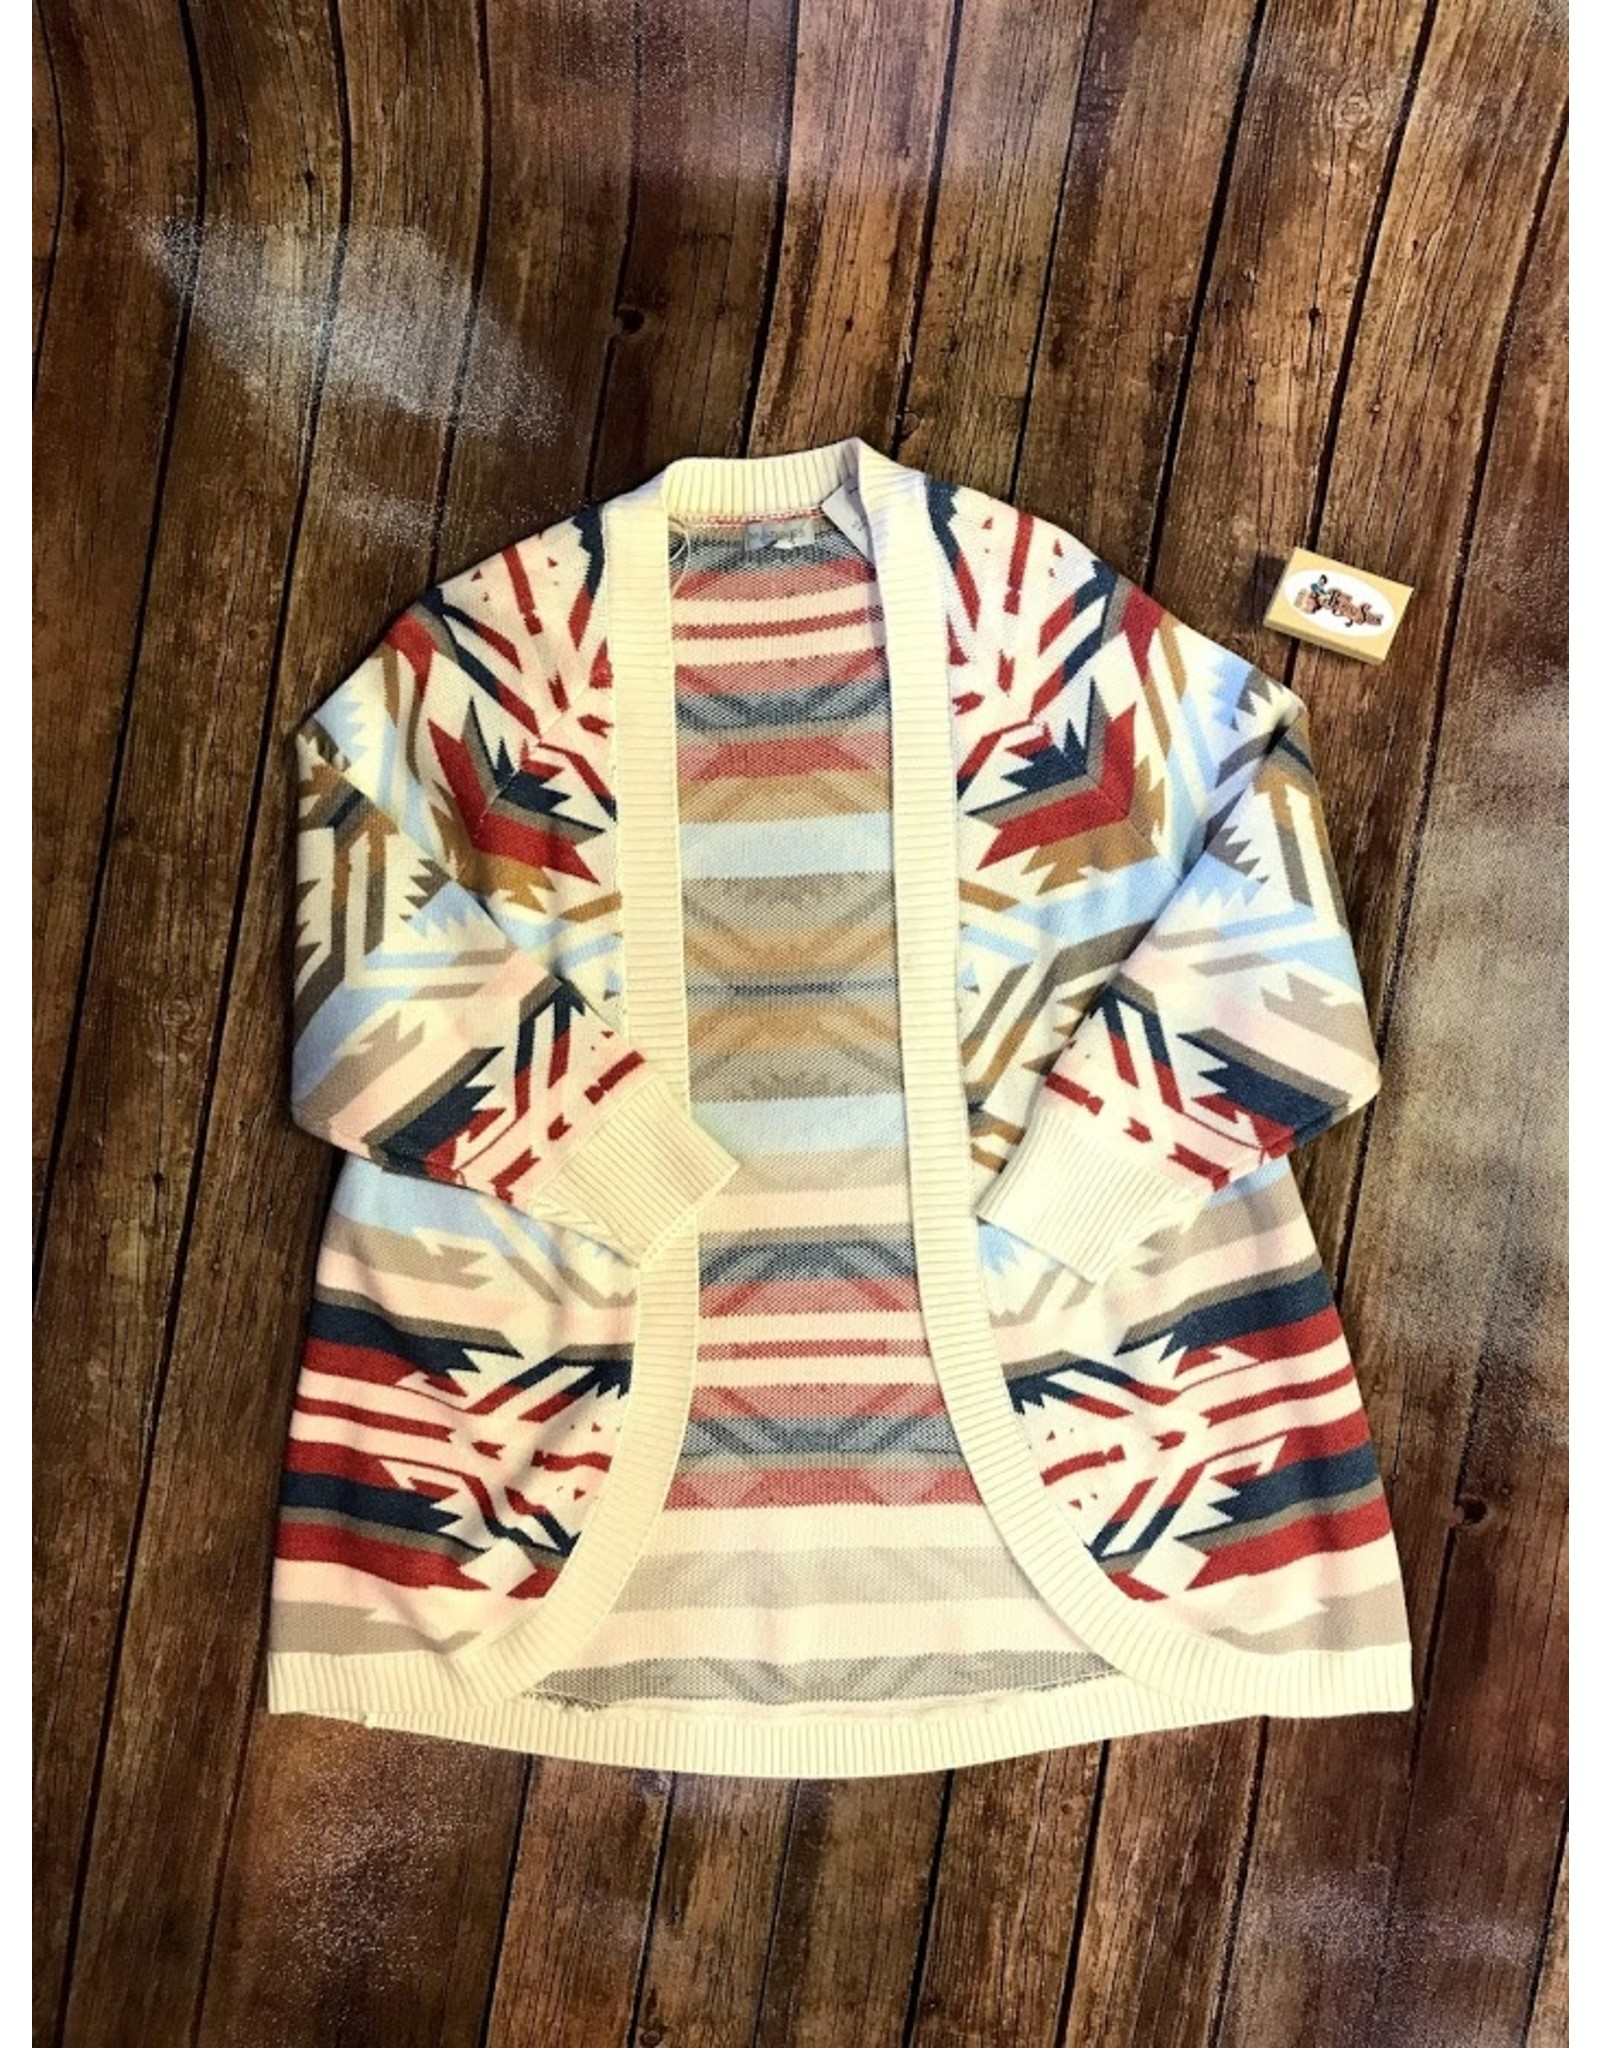 Jerell Clothing Company Cuffed 3/4 Raglan Slv Cardigan